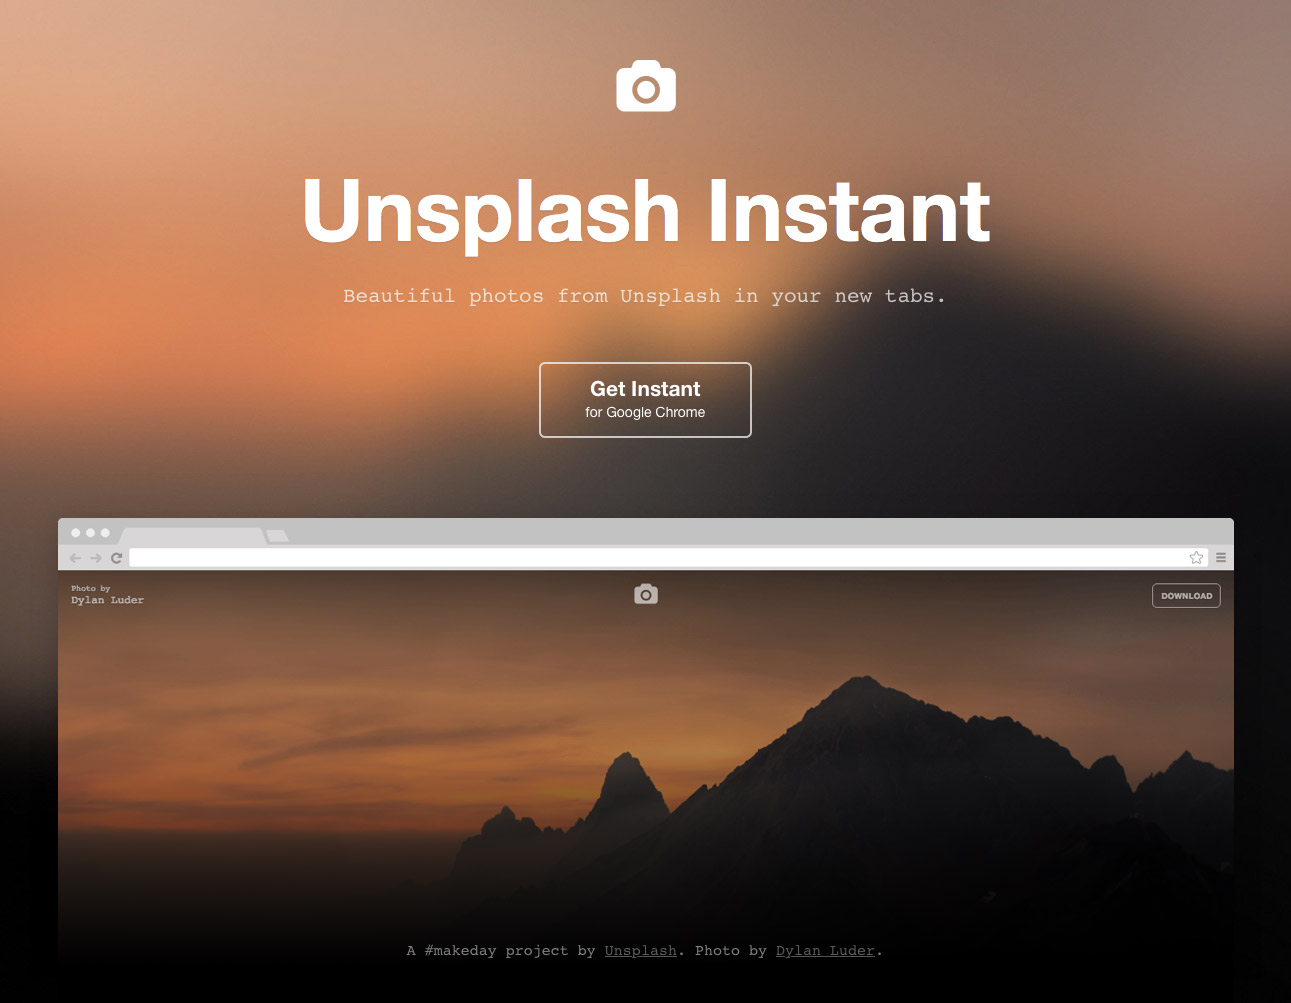 unsplash-instant